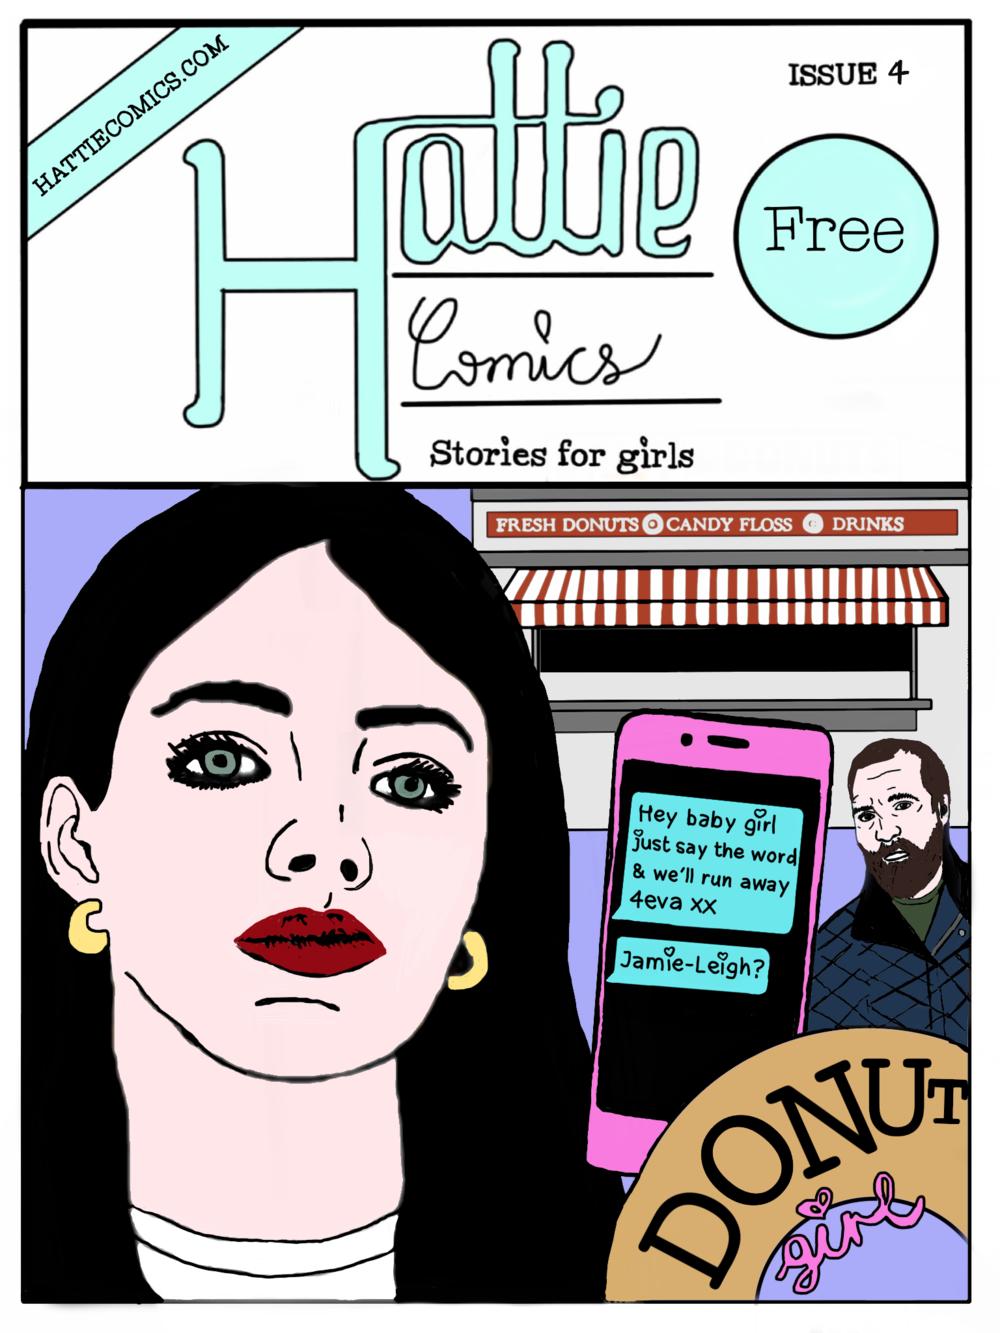 Hattie Comics, Stories for Girls, Issue 4.